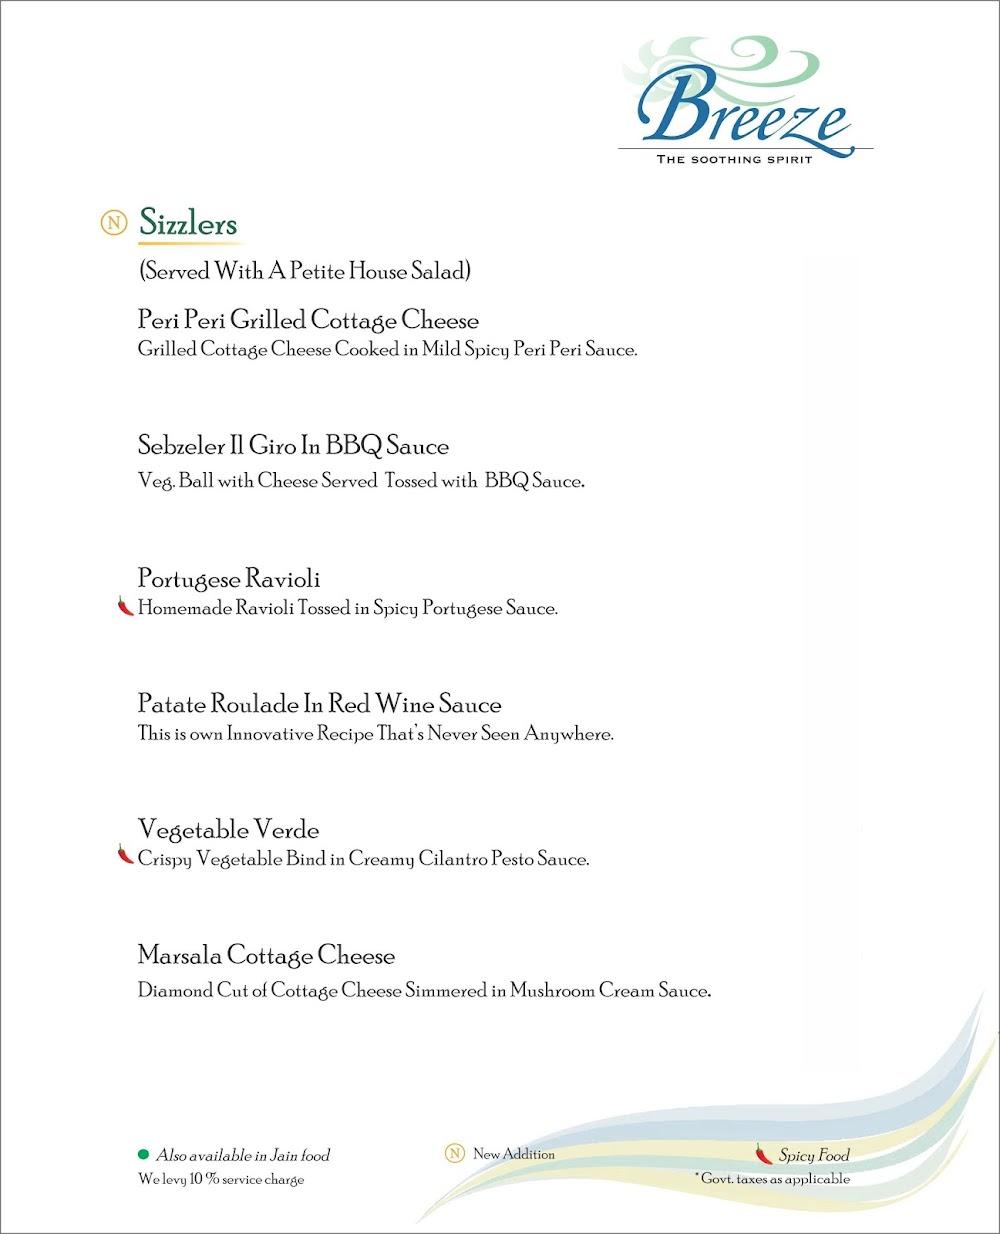 Breeze Lounge menu 10